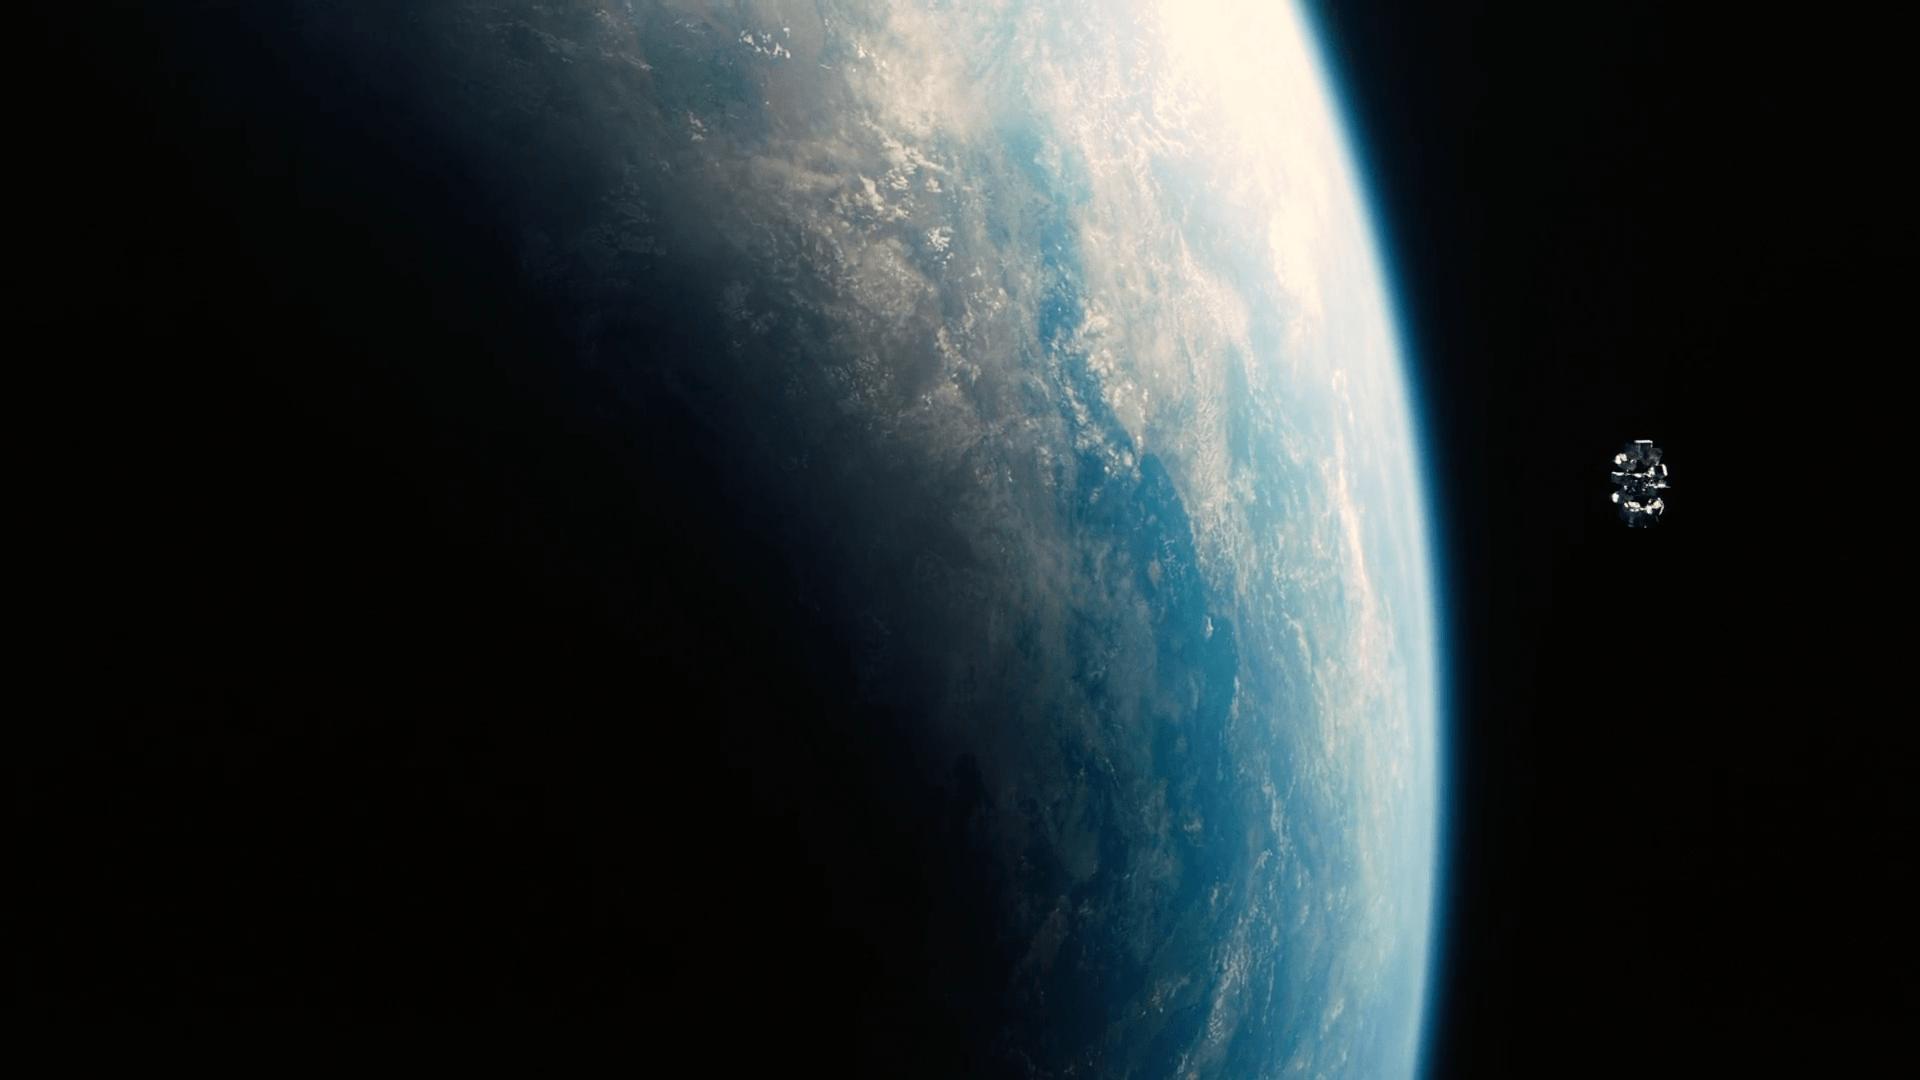 Interstellar Wallpaper (75 Wallpapers) – HD Wallpapers